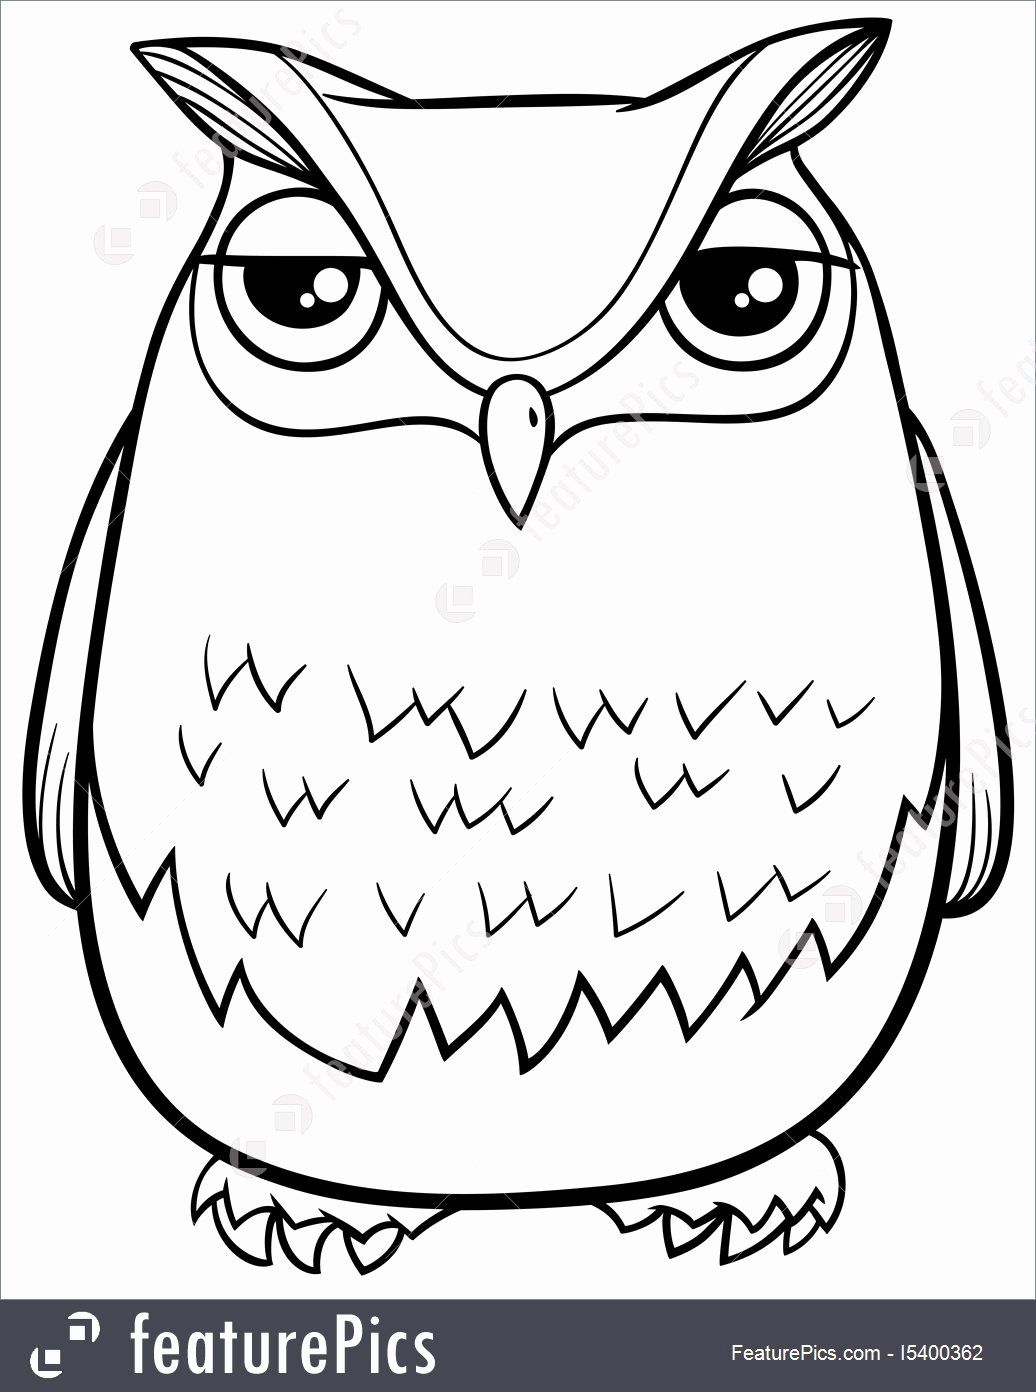 Coloring Cartoon Birds New Cartoon Owl Coloring Page Stock Illustration I At Featurepics Owl Coloring Pages Owl Cartoon Cartoon Birds